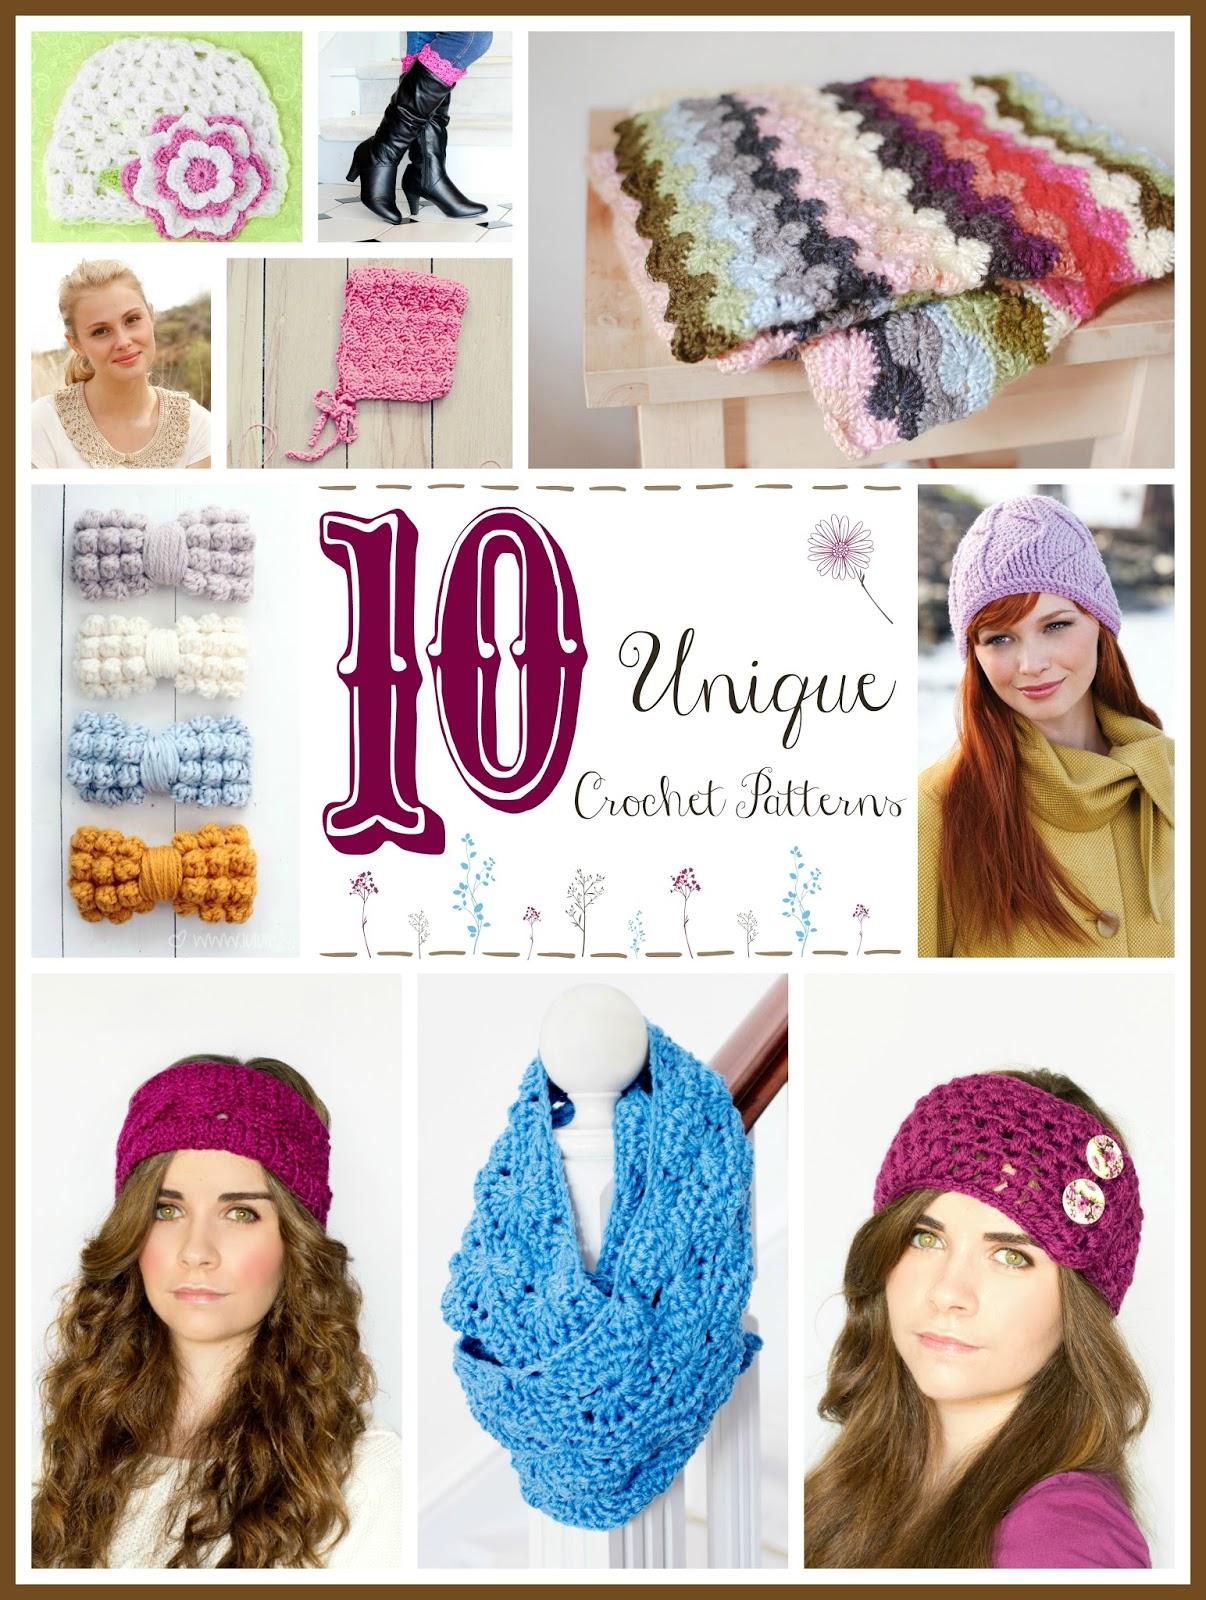 http://2.bp.blogspot.com/-ioWb3oYAHeA/U3dZjsrh1nI/AAAAAAAAJrA/LH5k-NCGS2g/s1600/10+Free+Unique+Crochet+Patterns+1.jpg